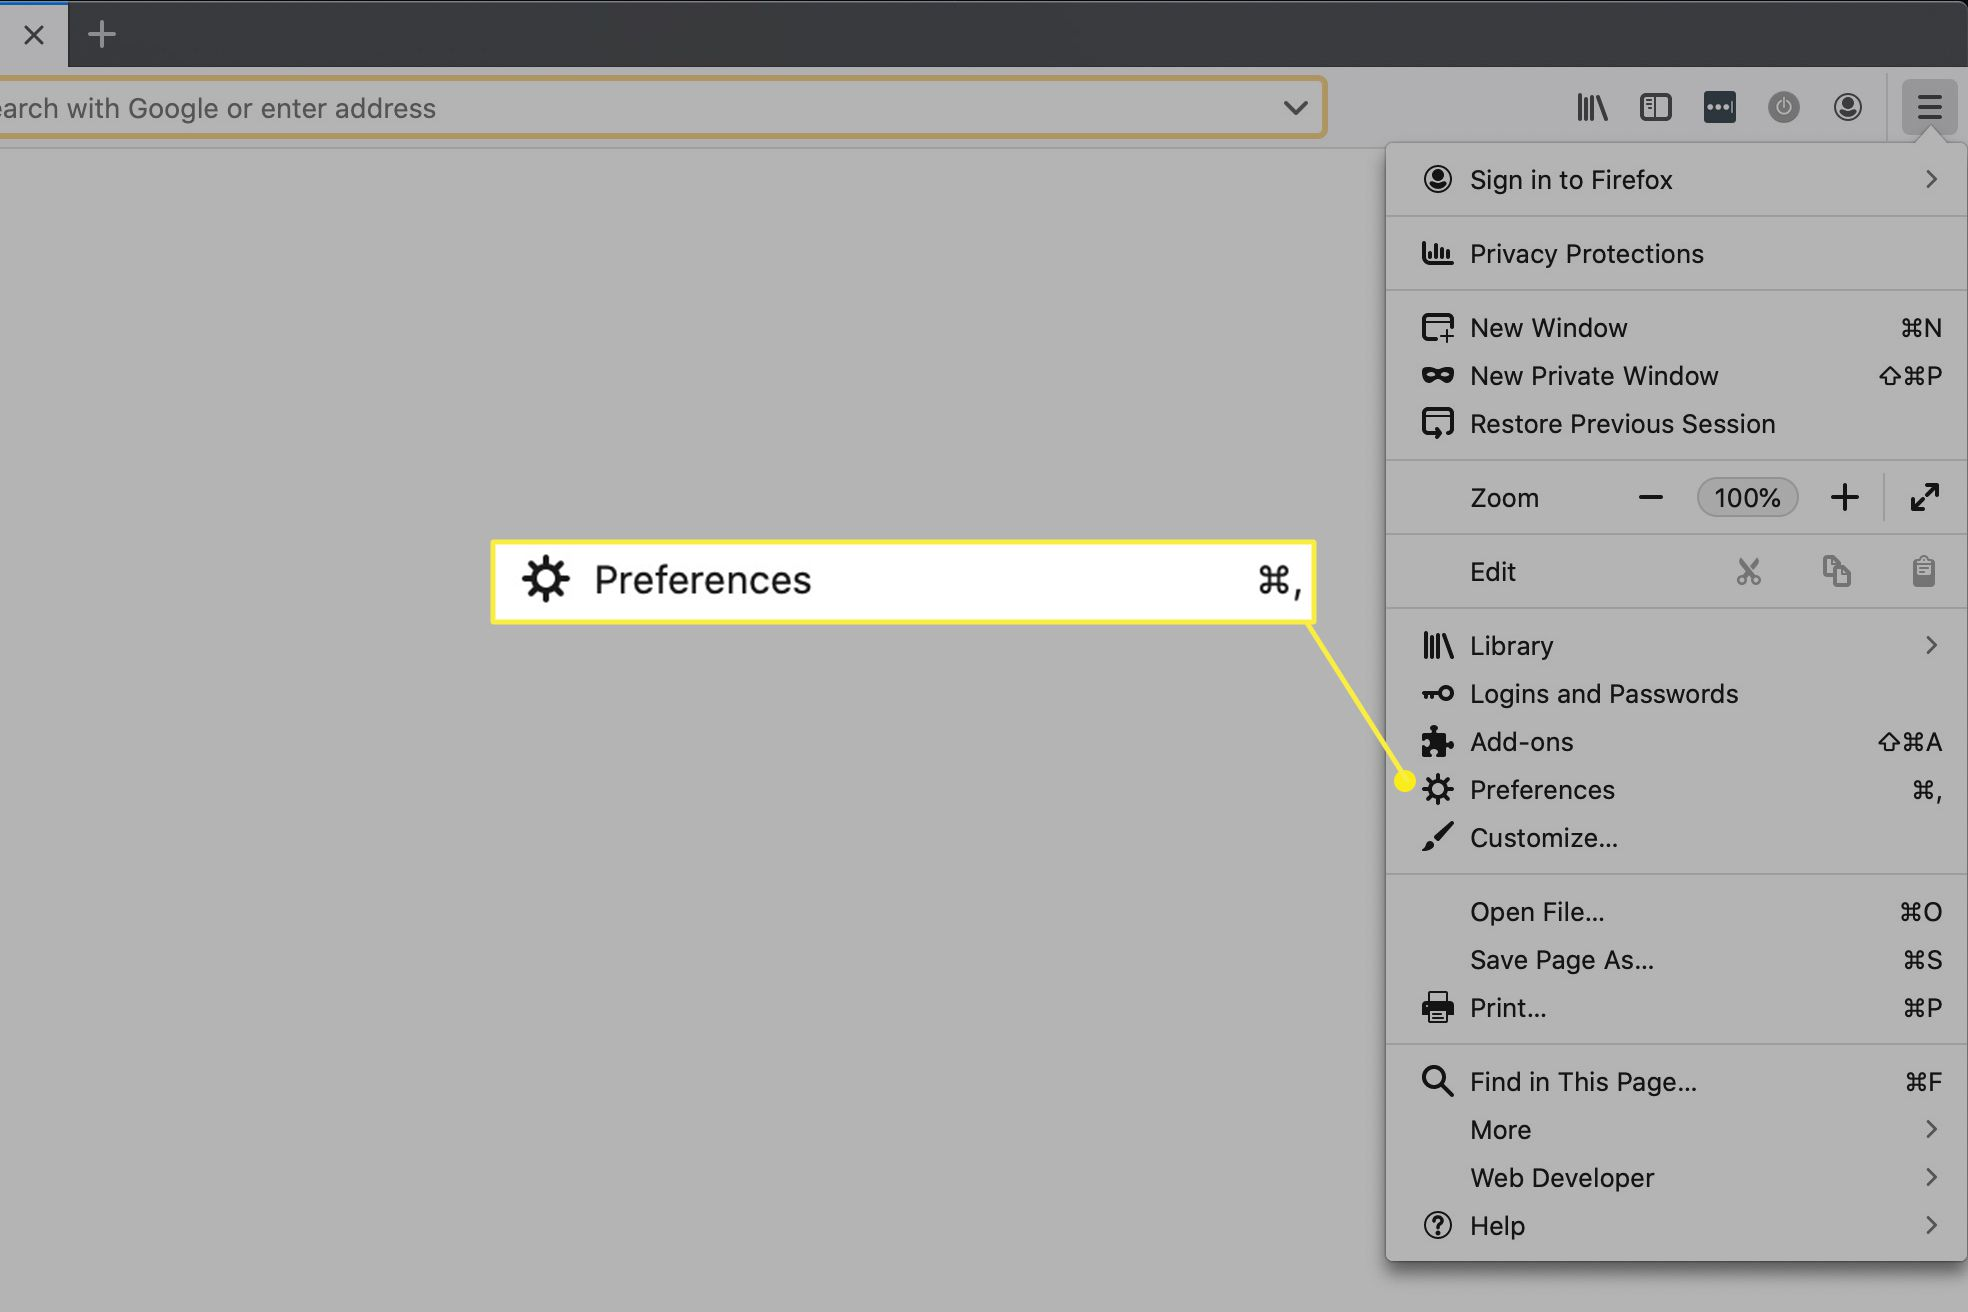 Firefox preferences